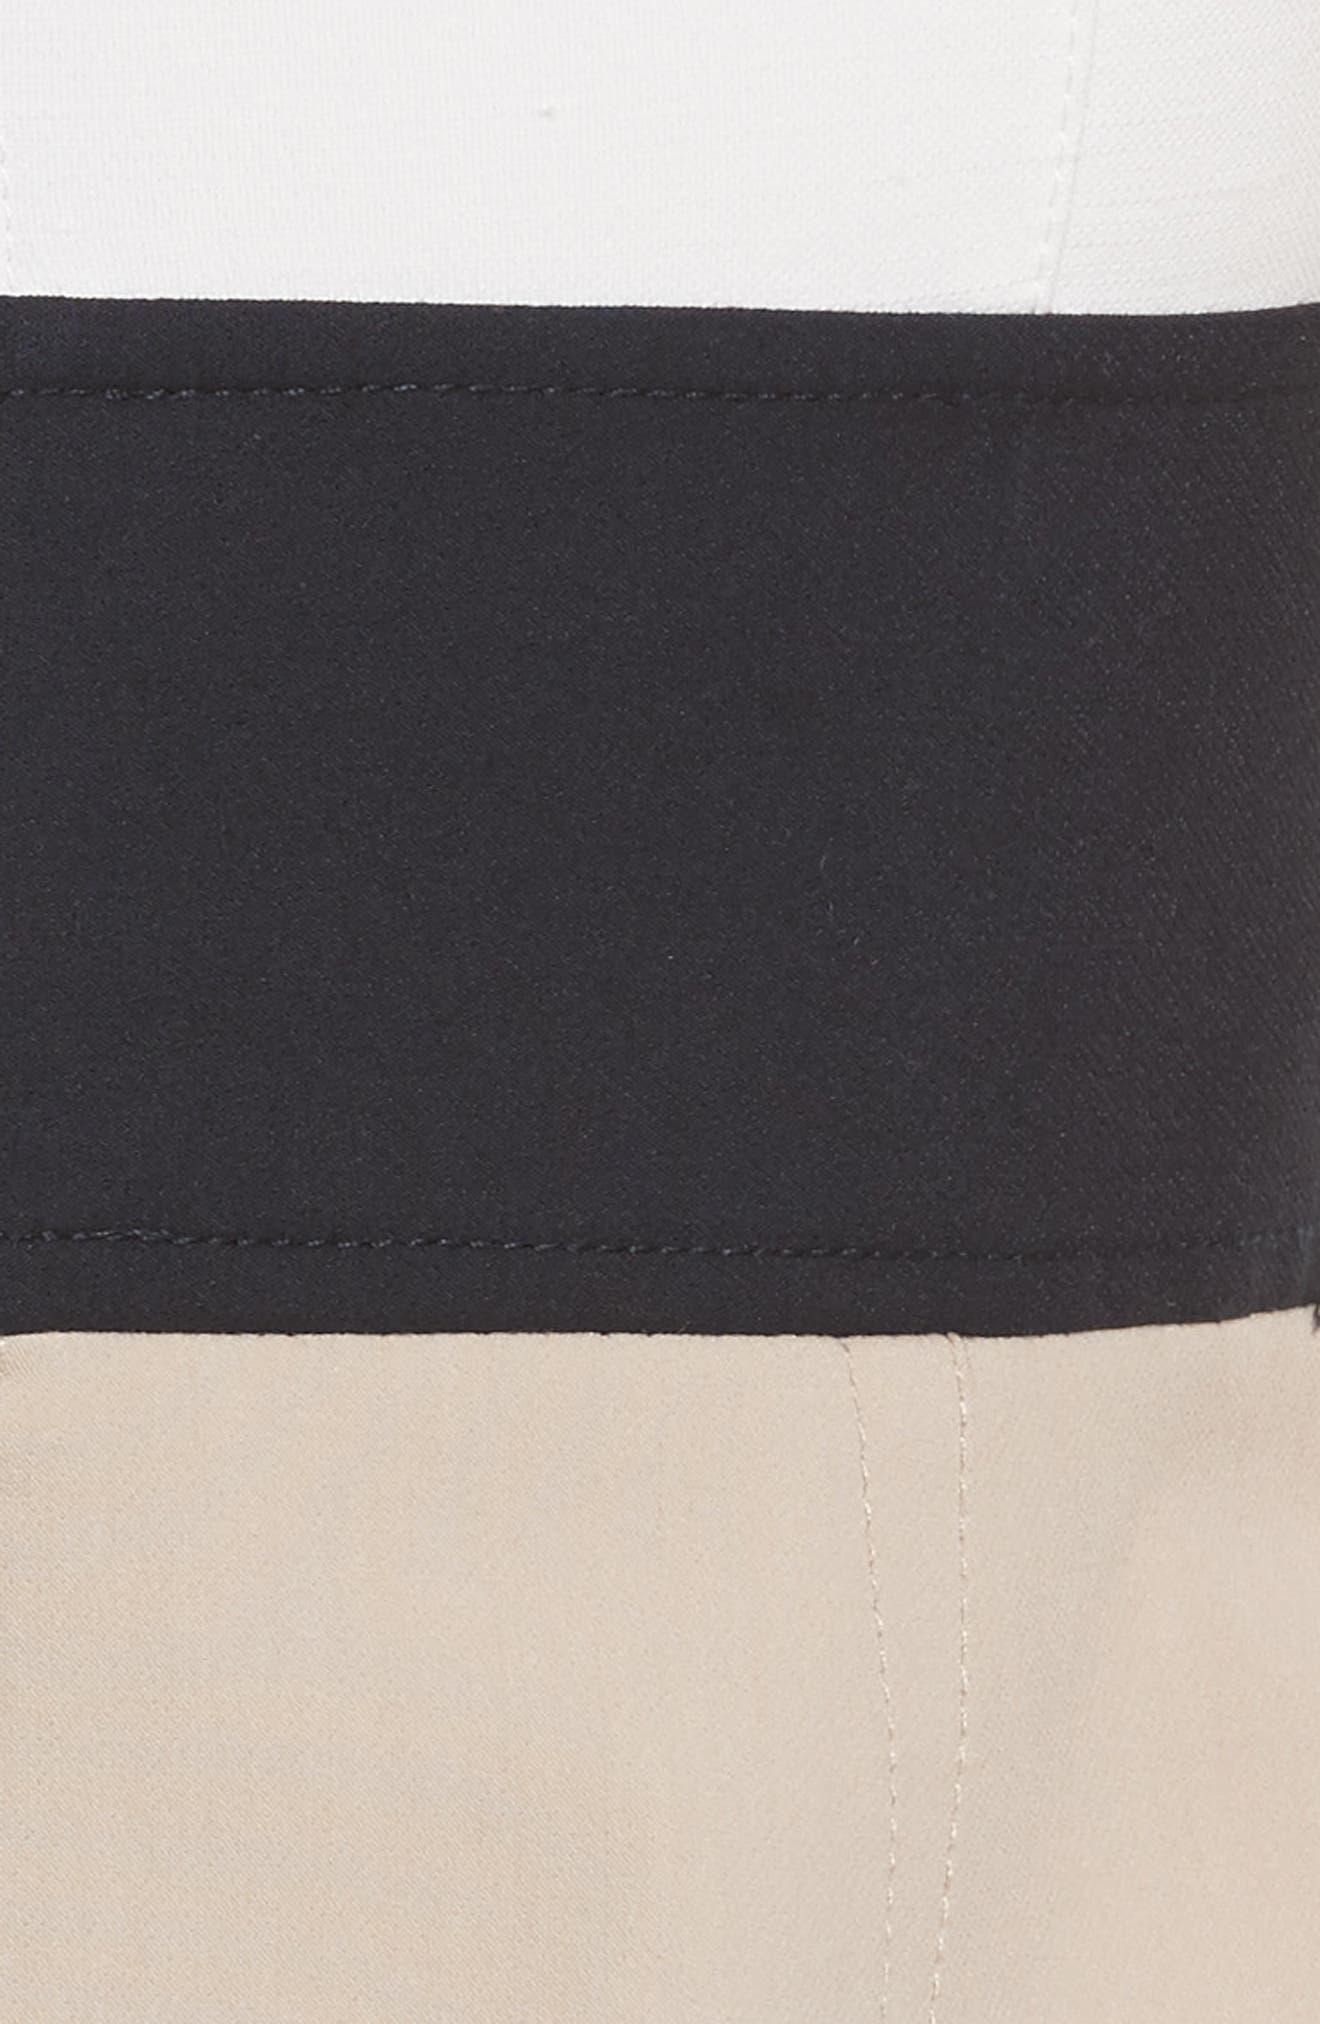 Diane von Furstenberg Colorblock Stretch Cotton Blend Sheath Dress,                             Alternate thumbnail 5, color,